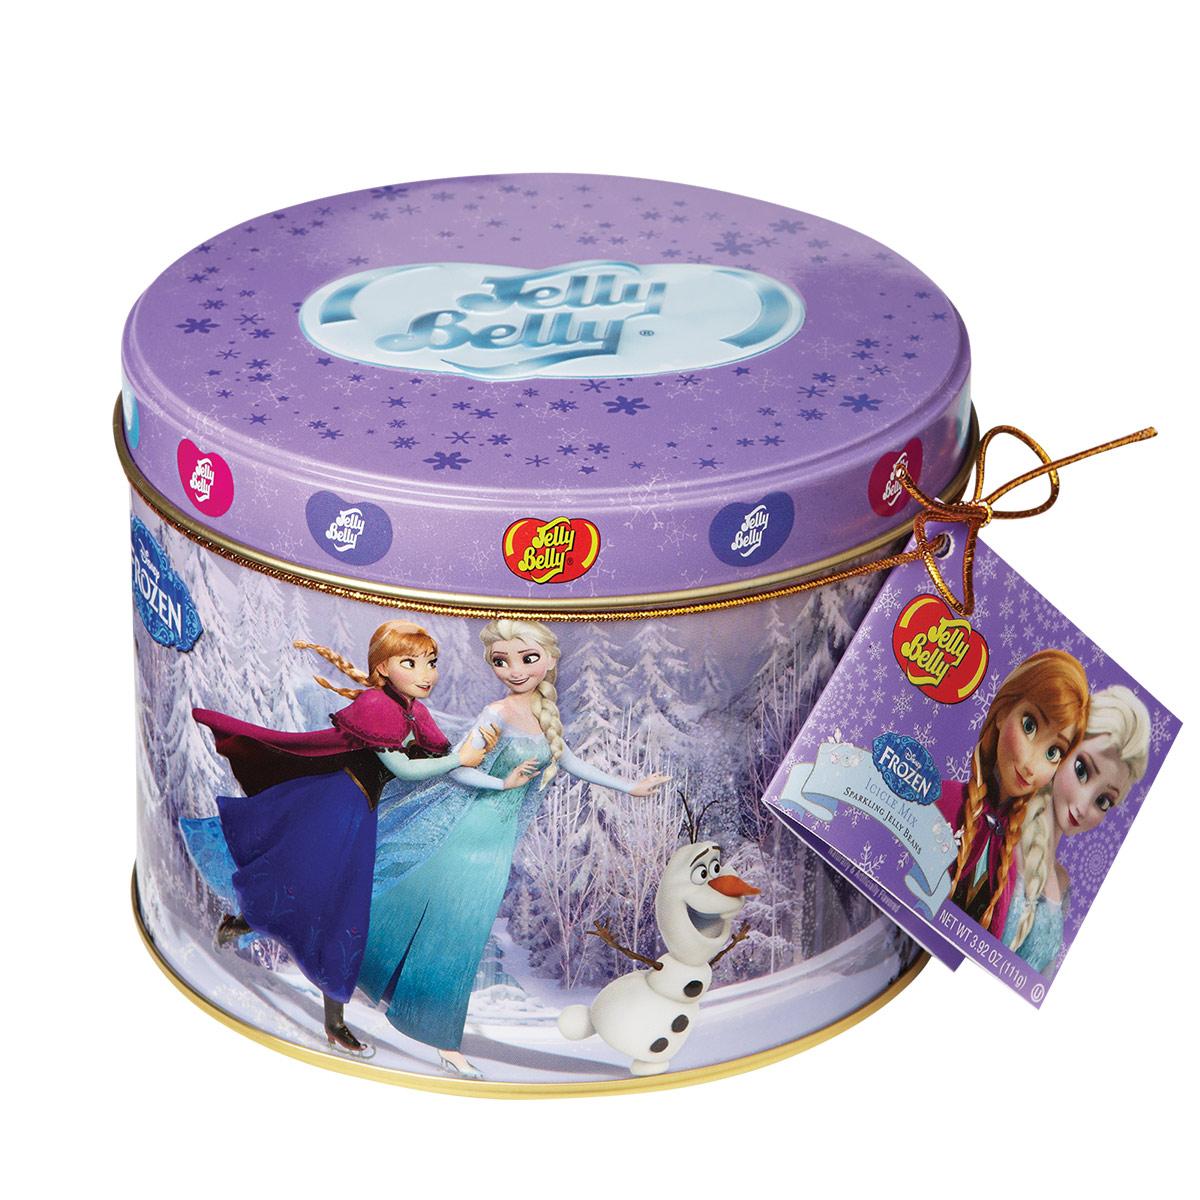 Elsa & Anna Birthday Party Supplies & Favors